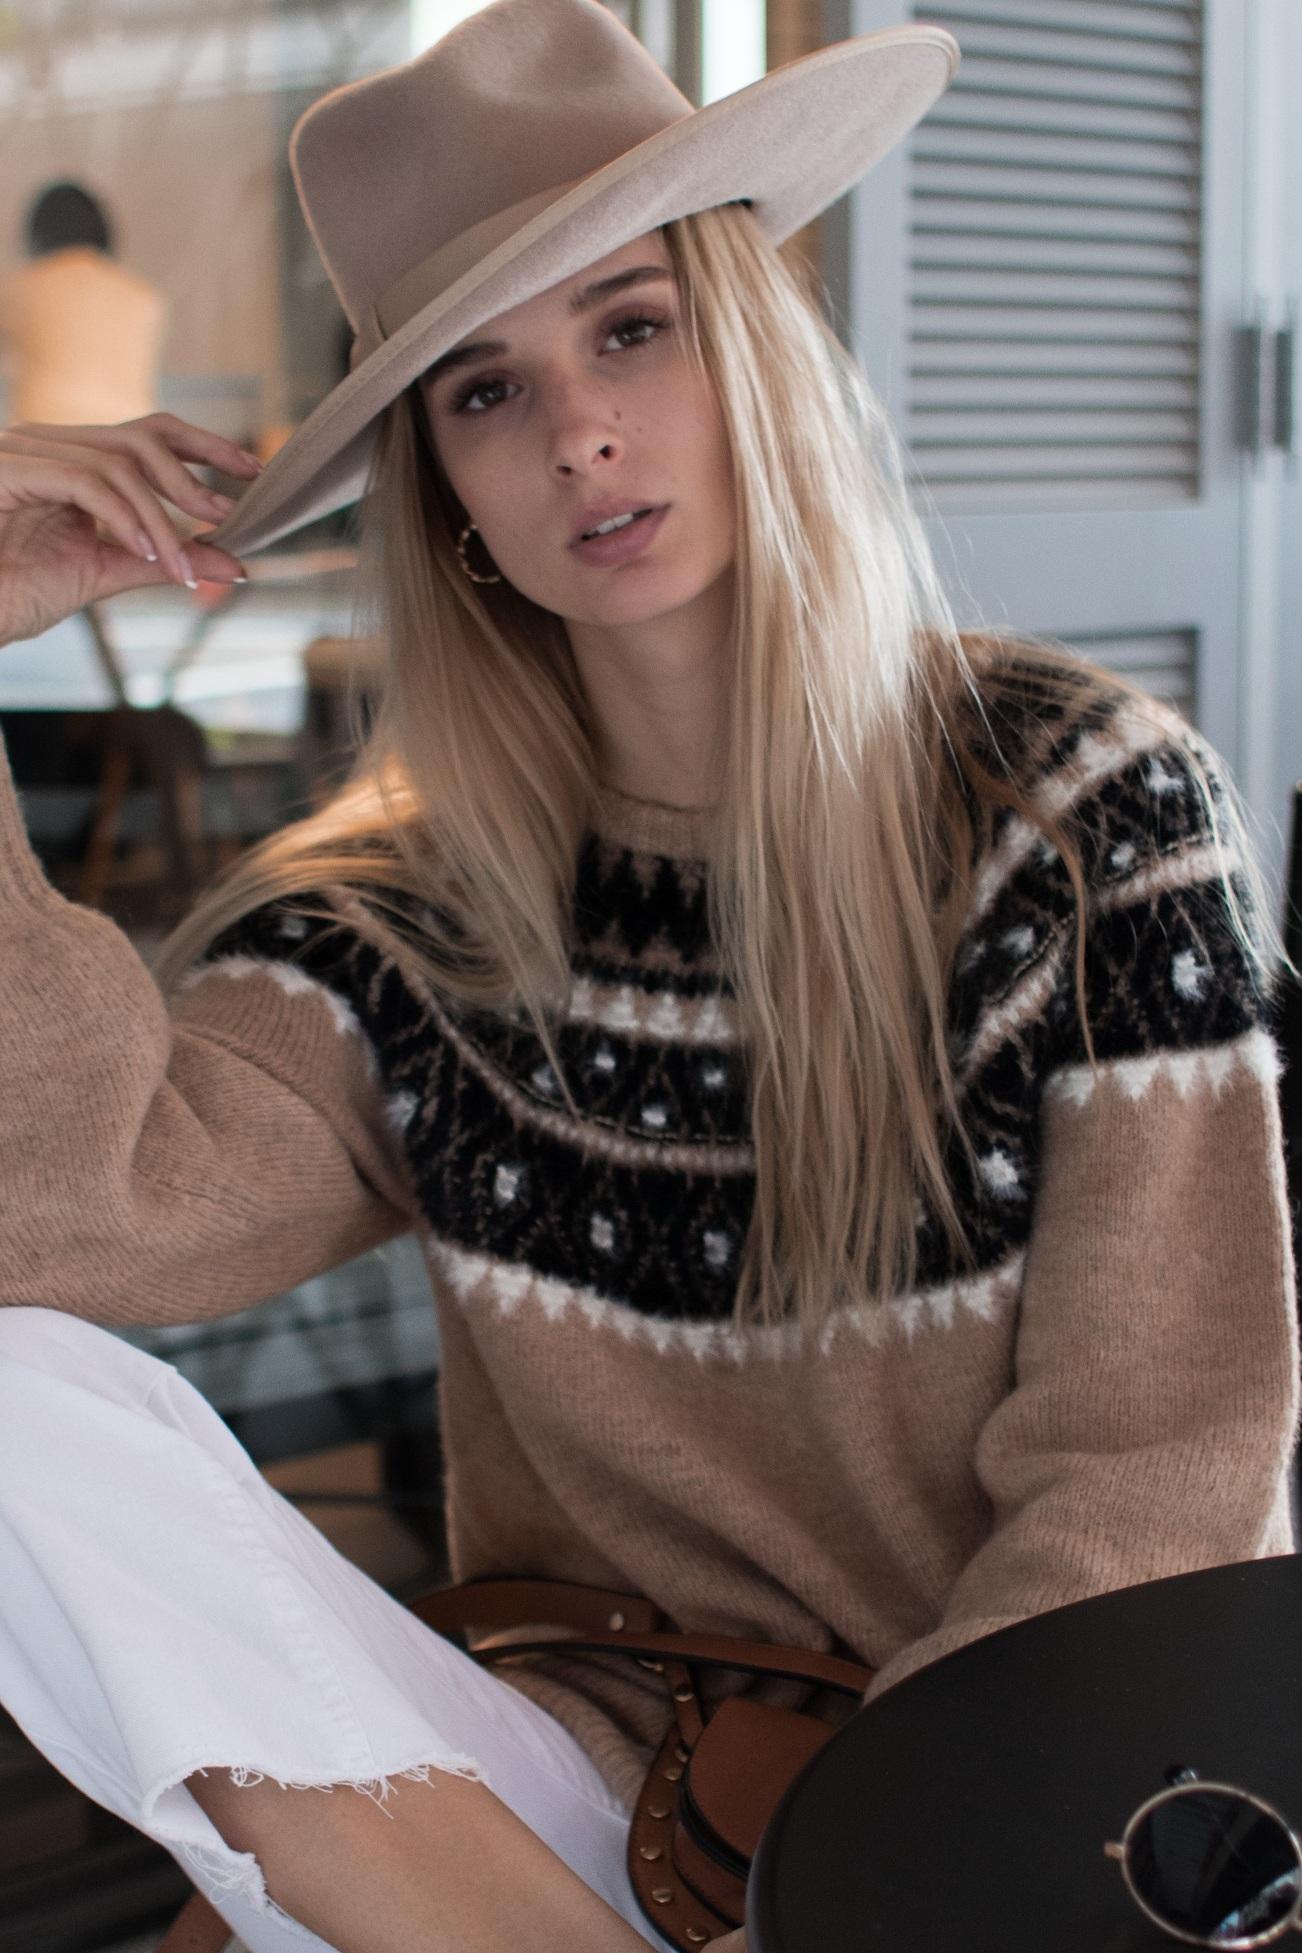 REF#ETSAKM15 | GAUGE: 7G | CONTENT: 49% Acrylic 25% Nylon 13% Mohair 12% Polyester 2% Wool